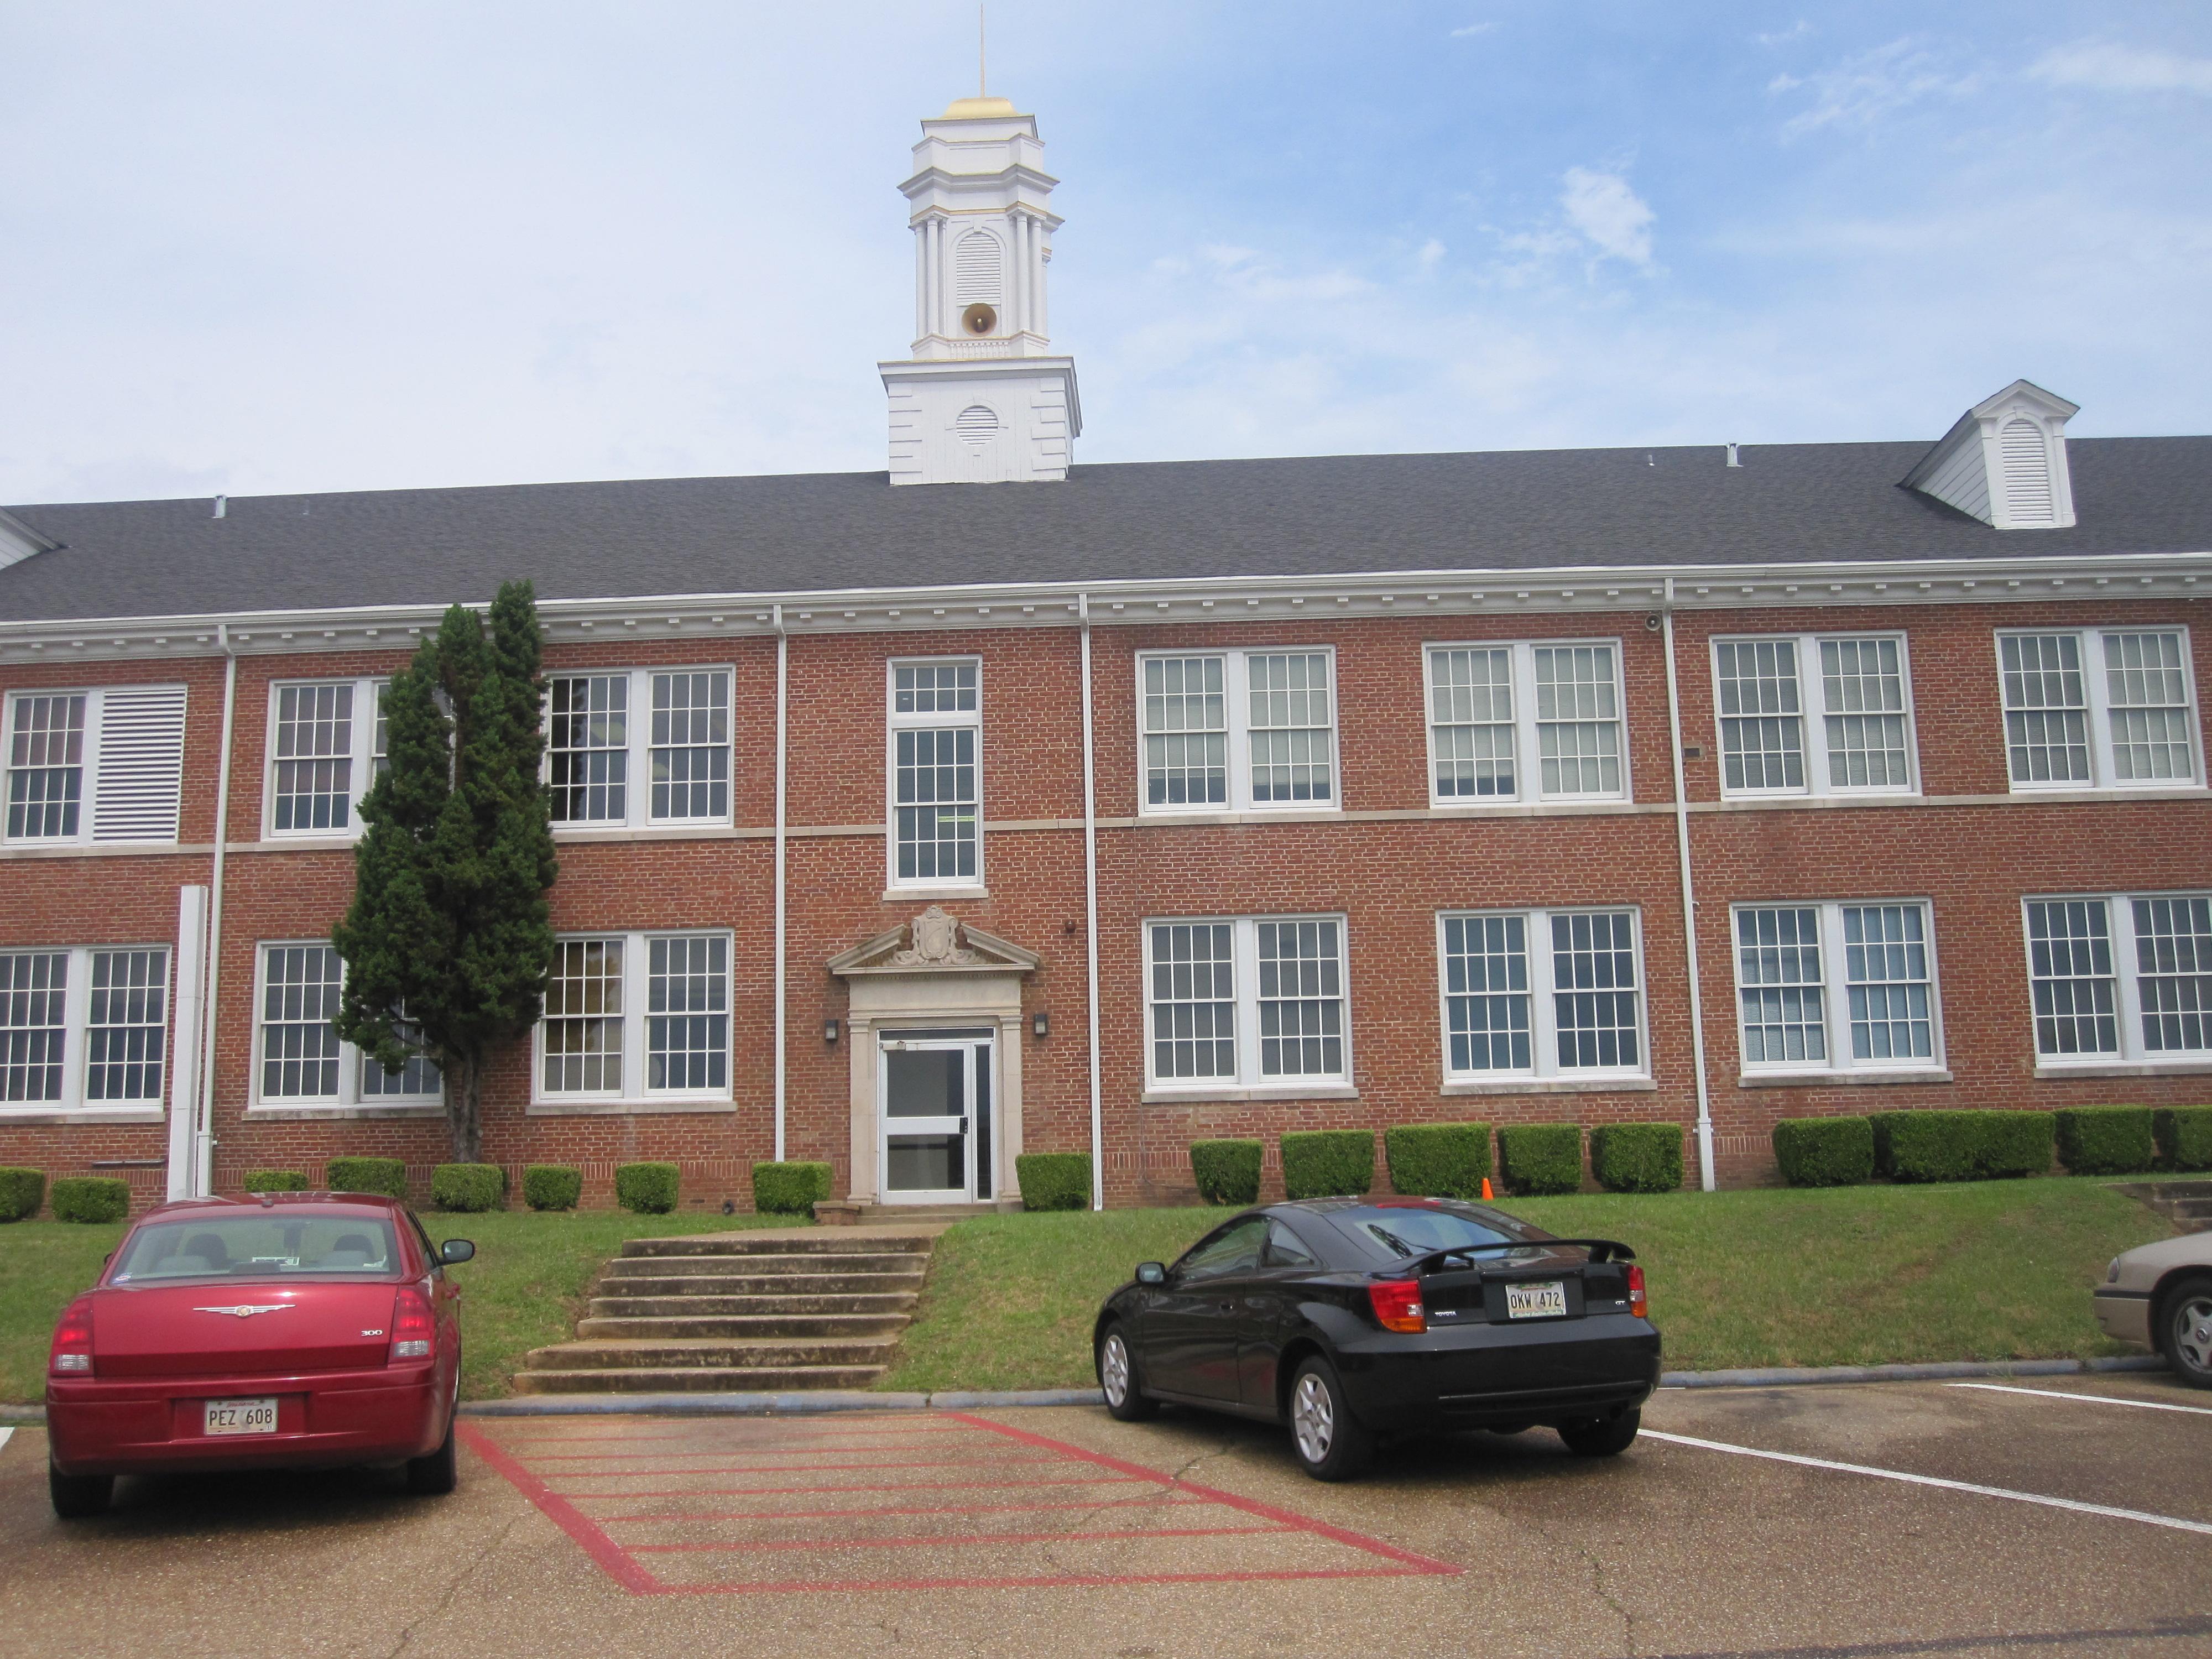 File:Long-Jones Hall at Grambling State Univ. IMG 3669.JPG